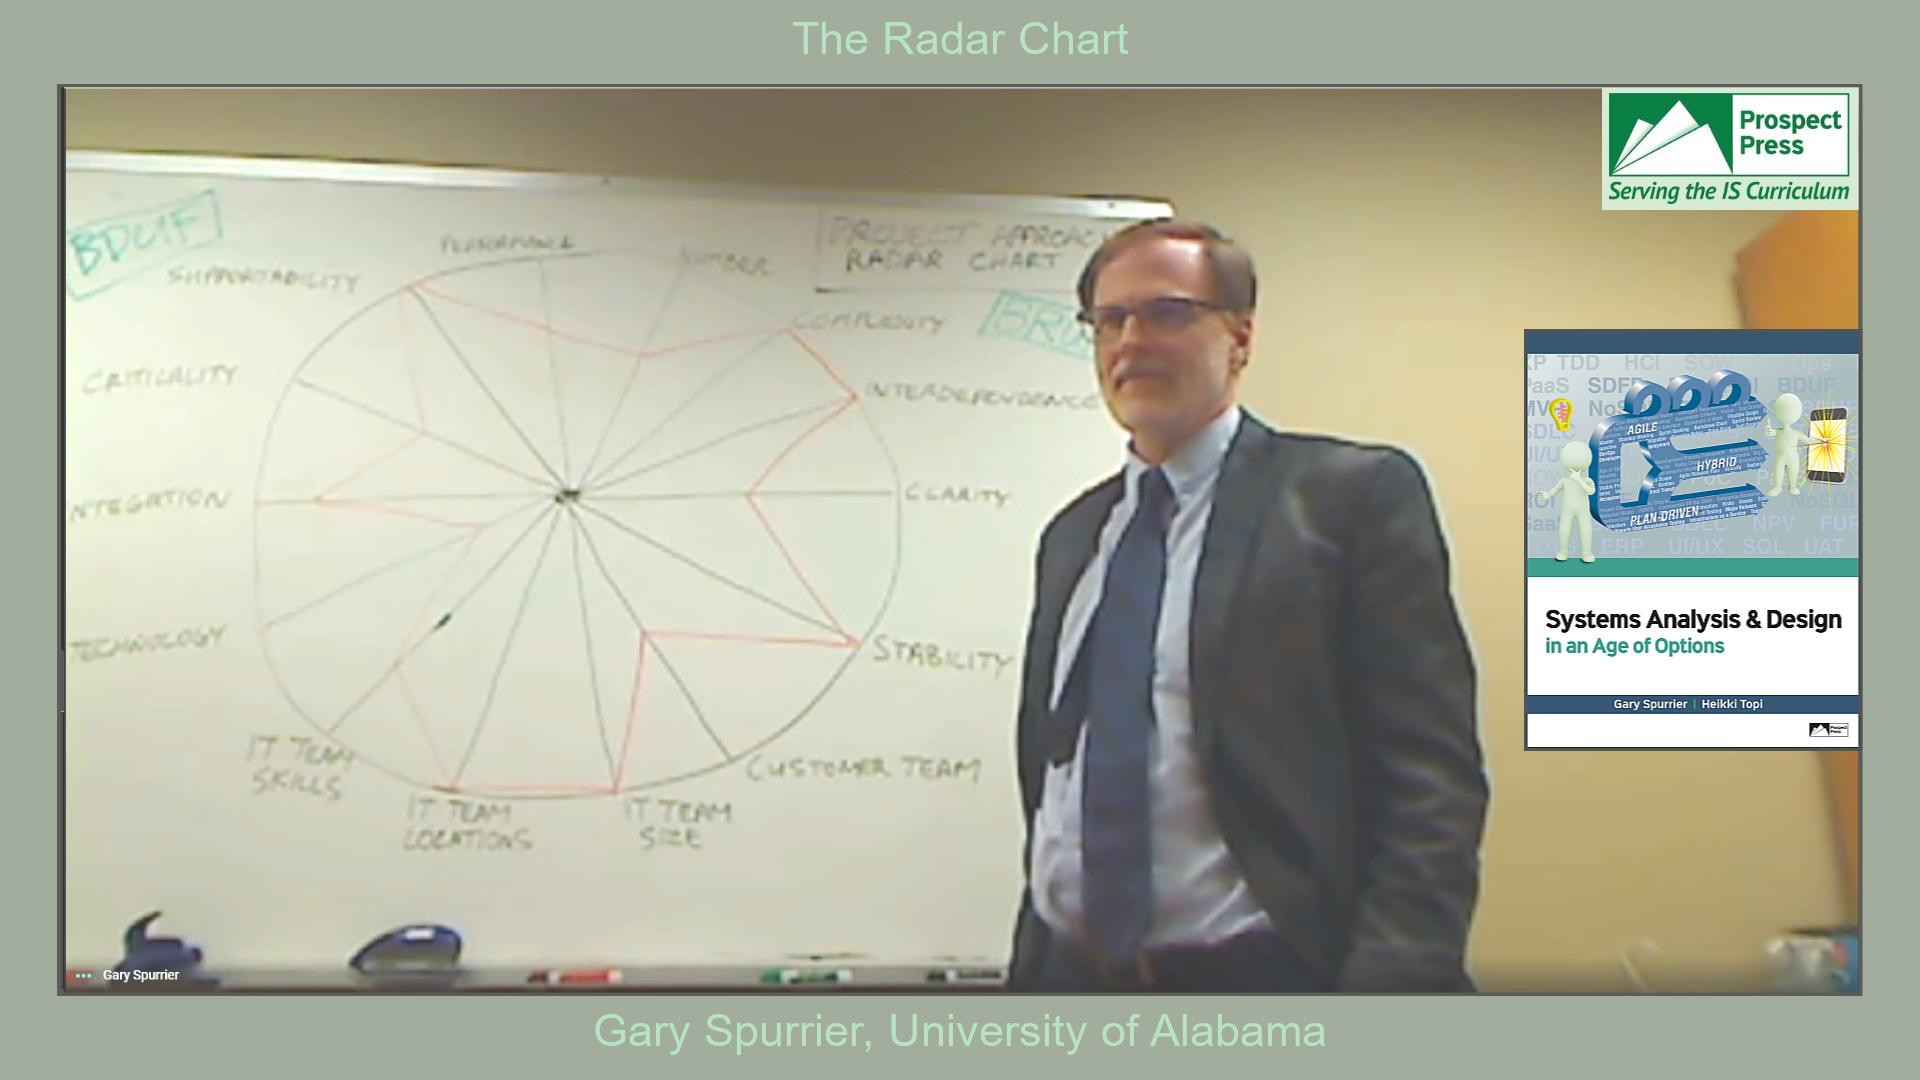 The Radar Chart